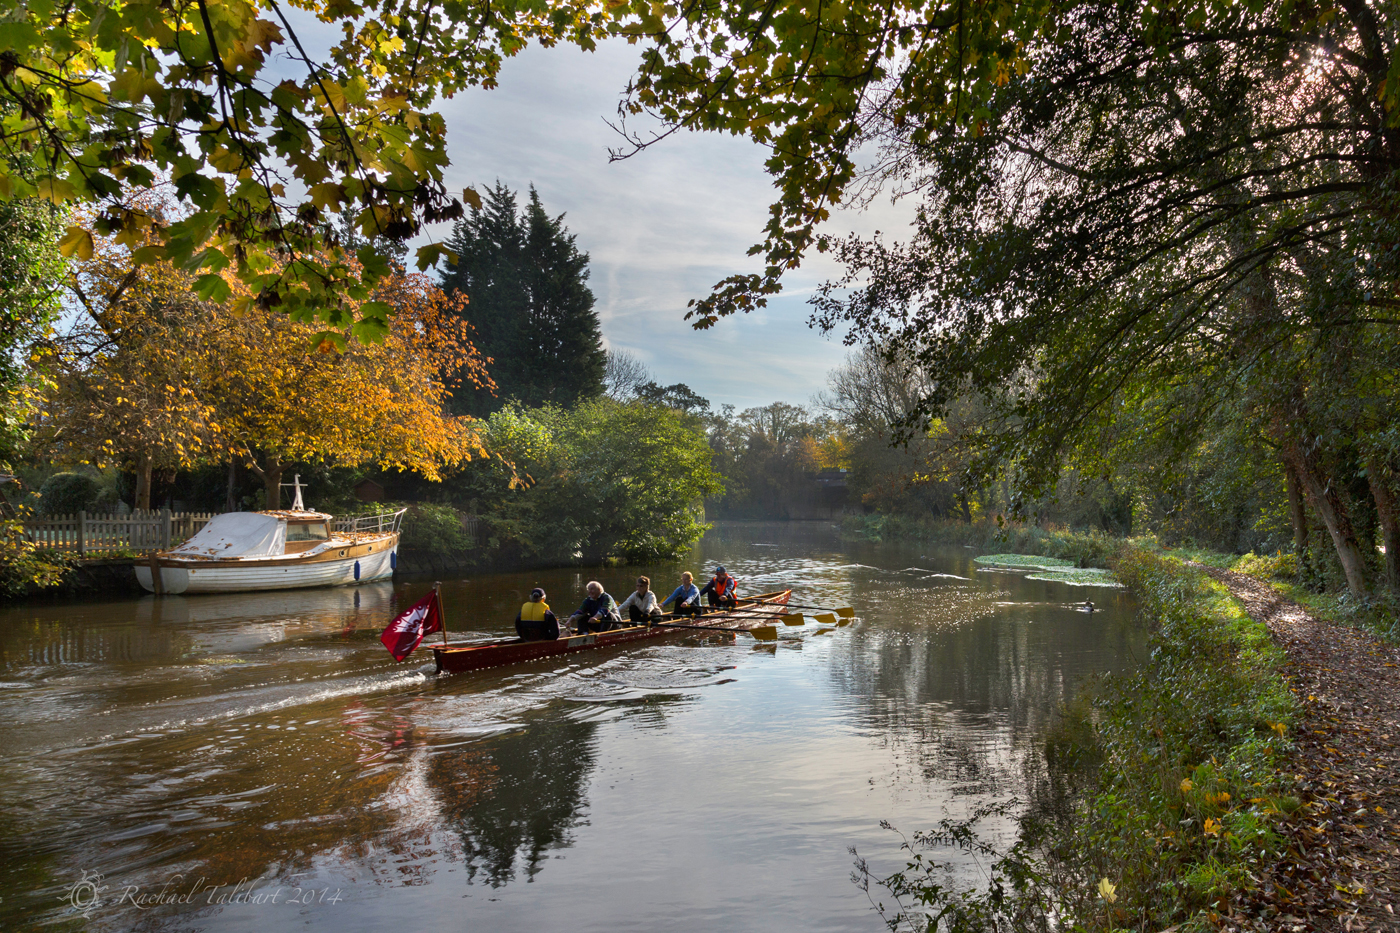 Wey Navigation rowers